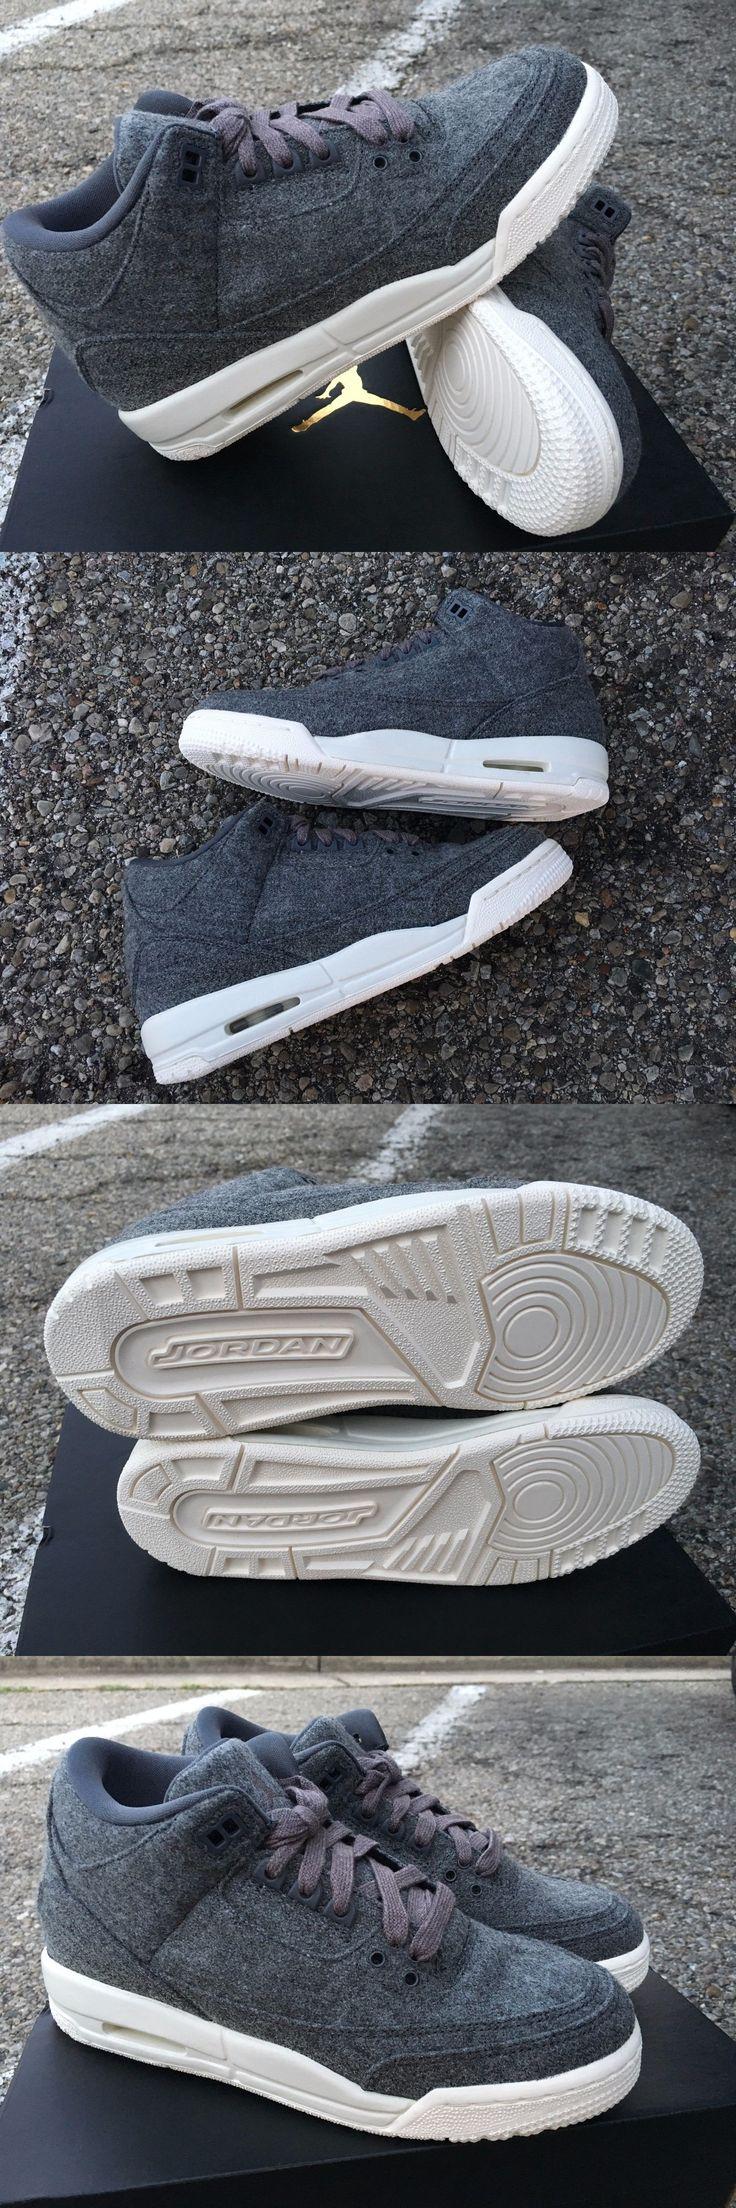 Boys Shoes 57929: Size 7 - New Air Jordan Retro 3 Iii Gs Youth Wool Bg Dark Grey 861427-004 - $150 -> BUY IT NOW ONLY: $59.99 on eBay!